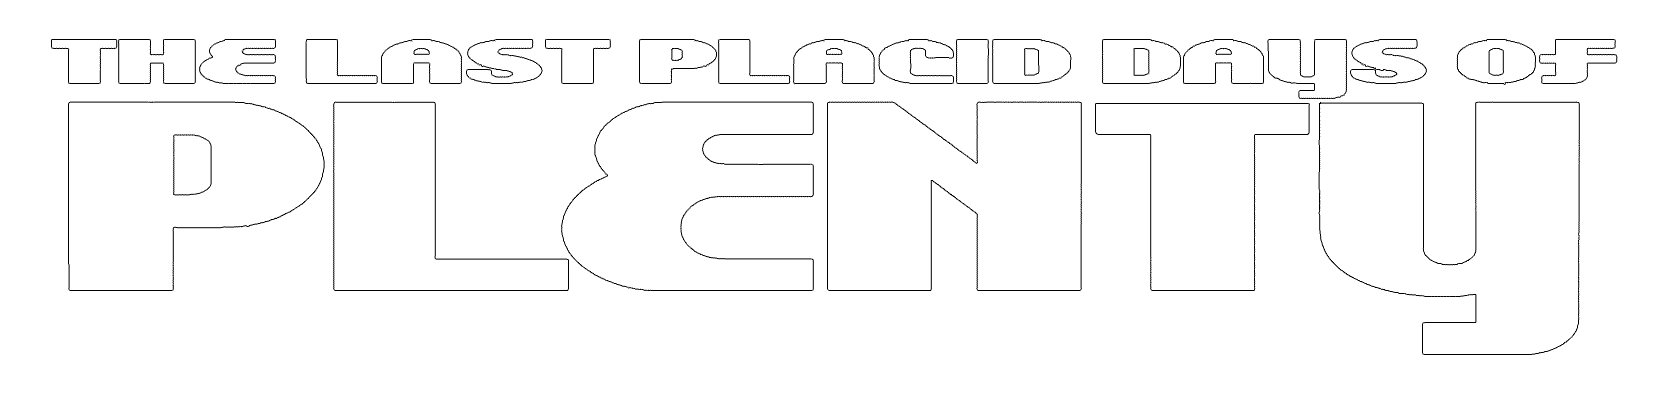 The Last Placid Days of Plenty - band logo